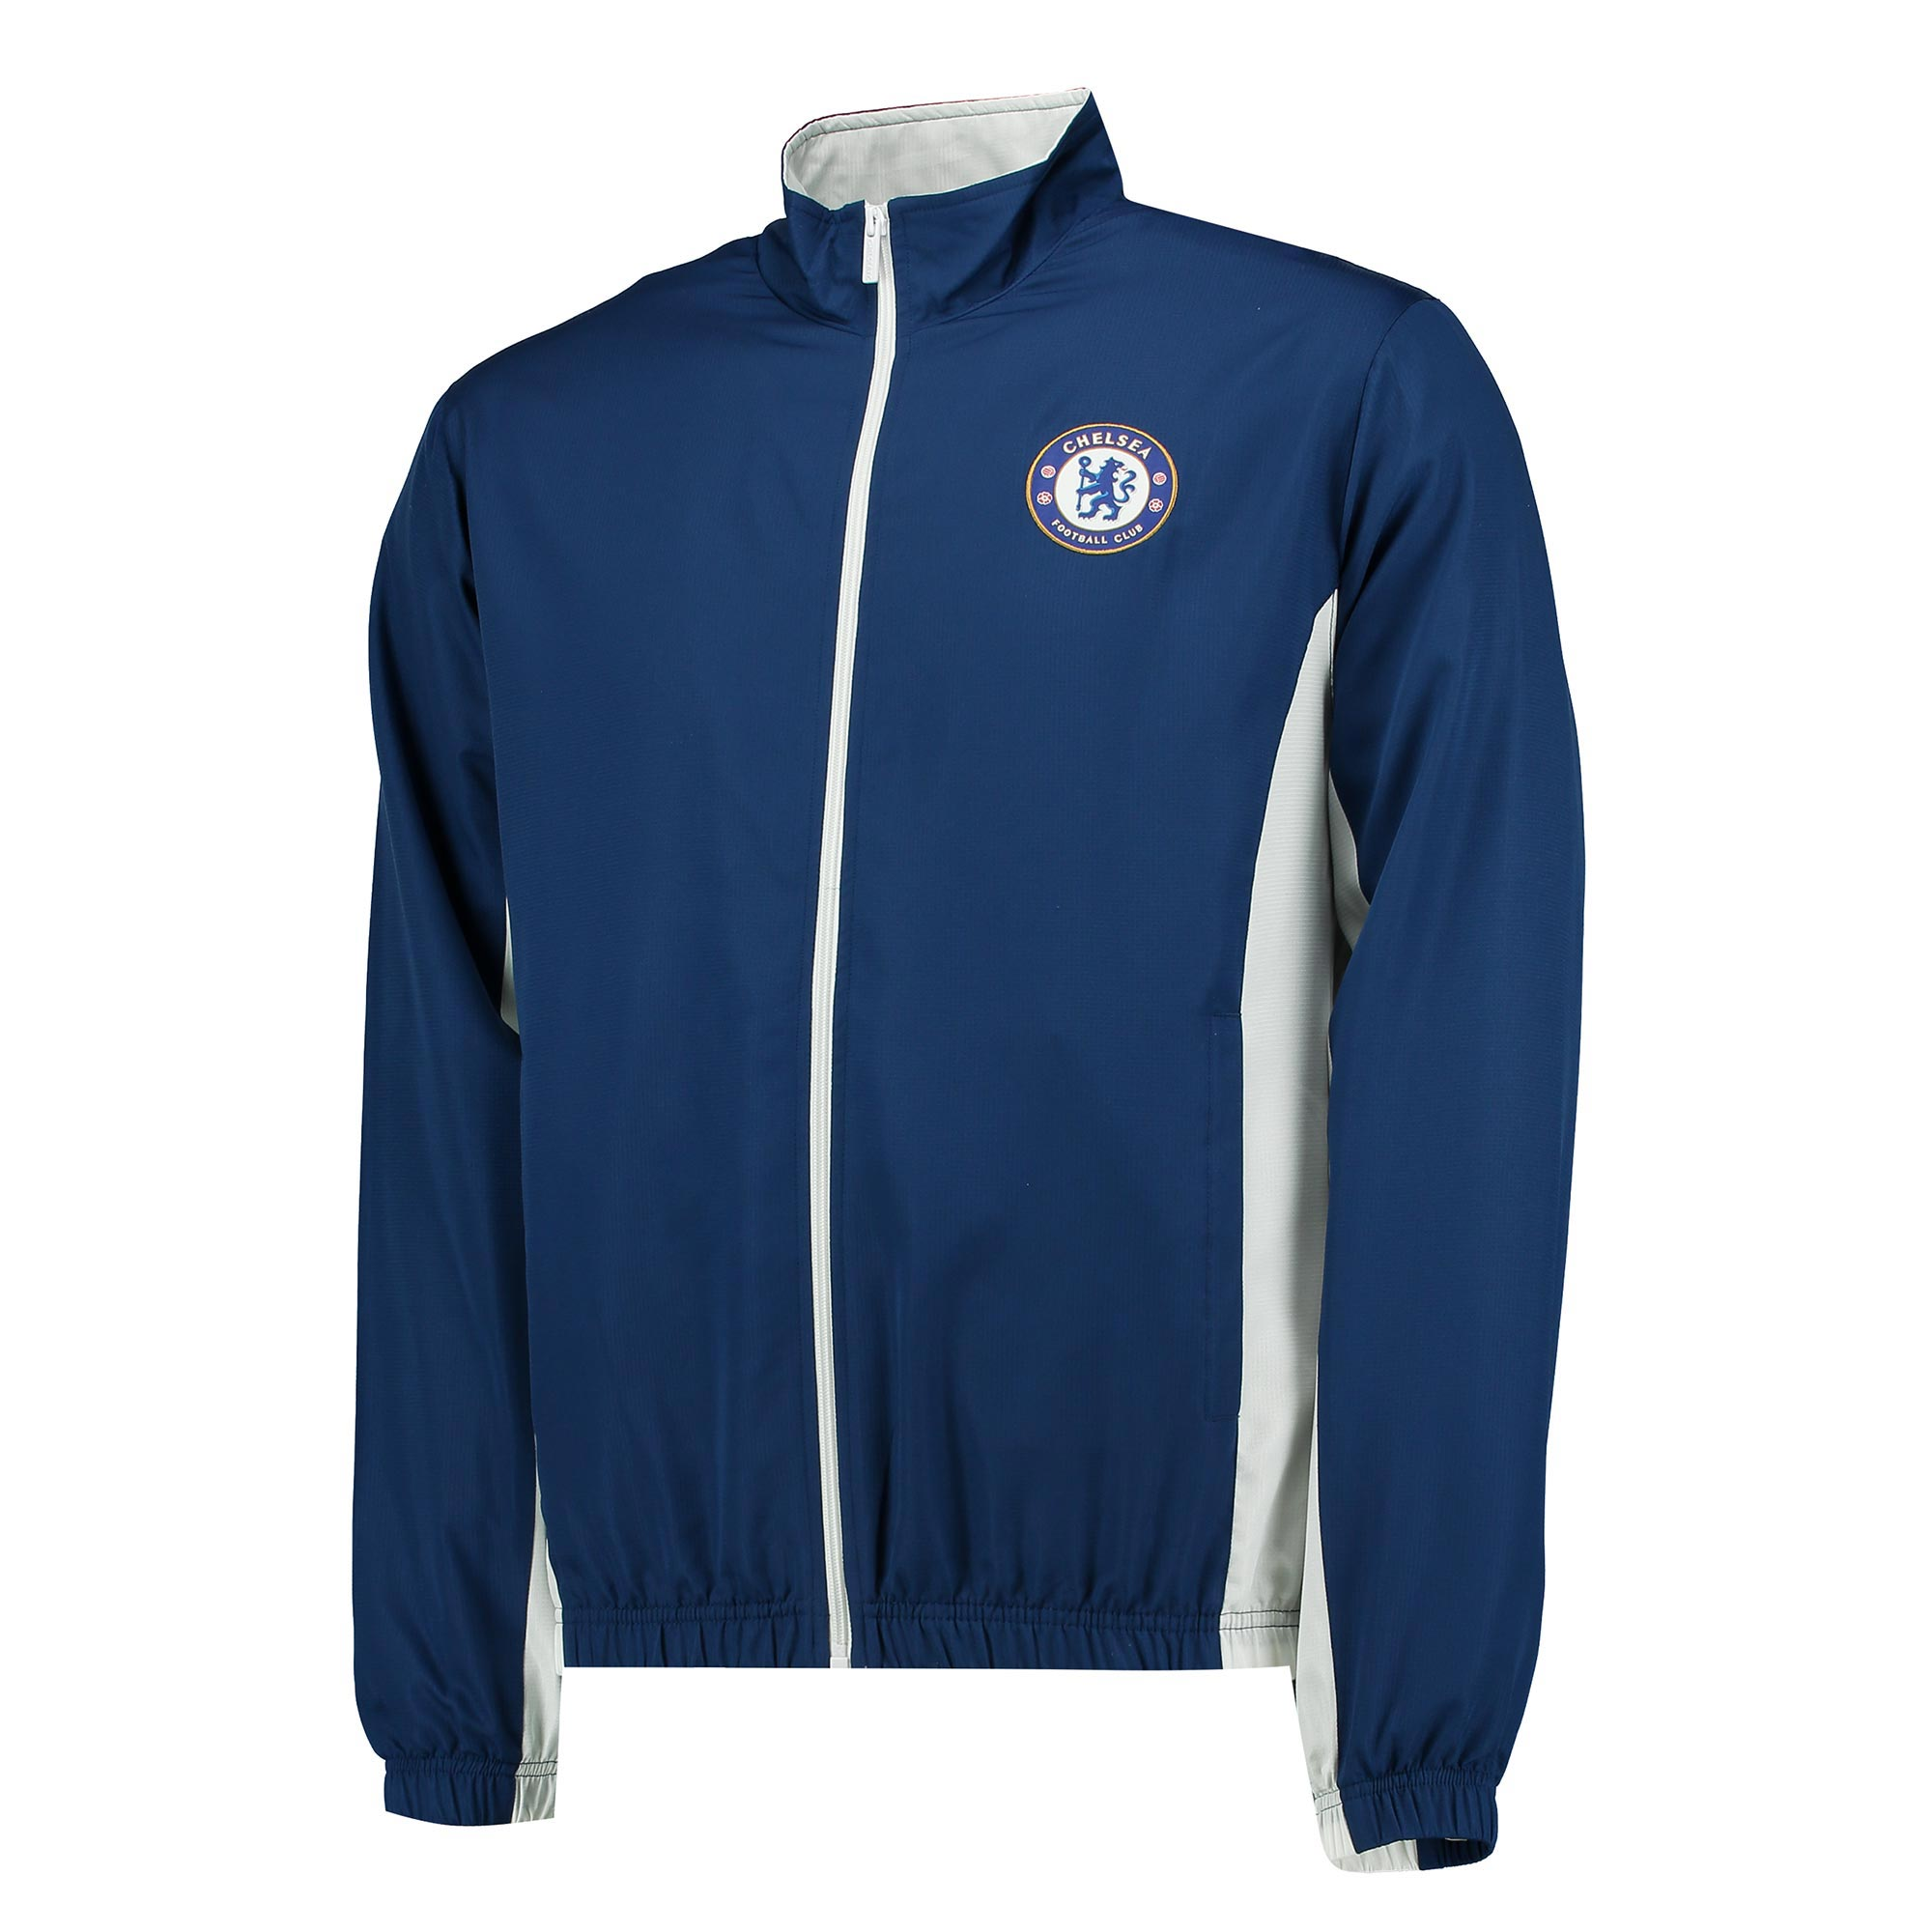 Chelsea Essential Woven Leisure Jacket - Estate Blue - Older Boys